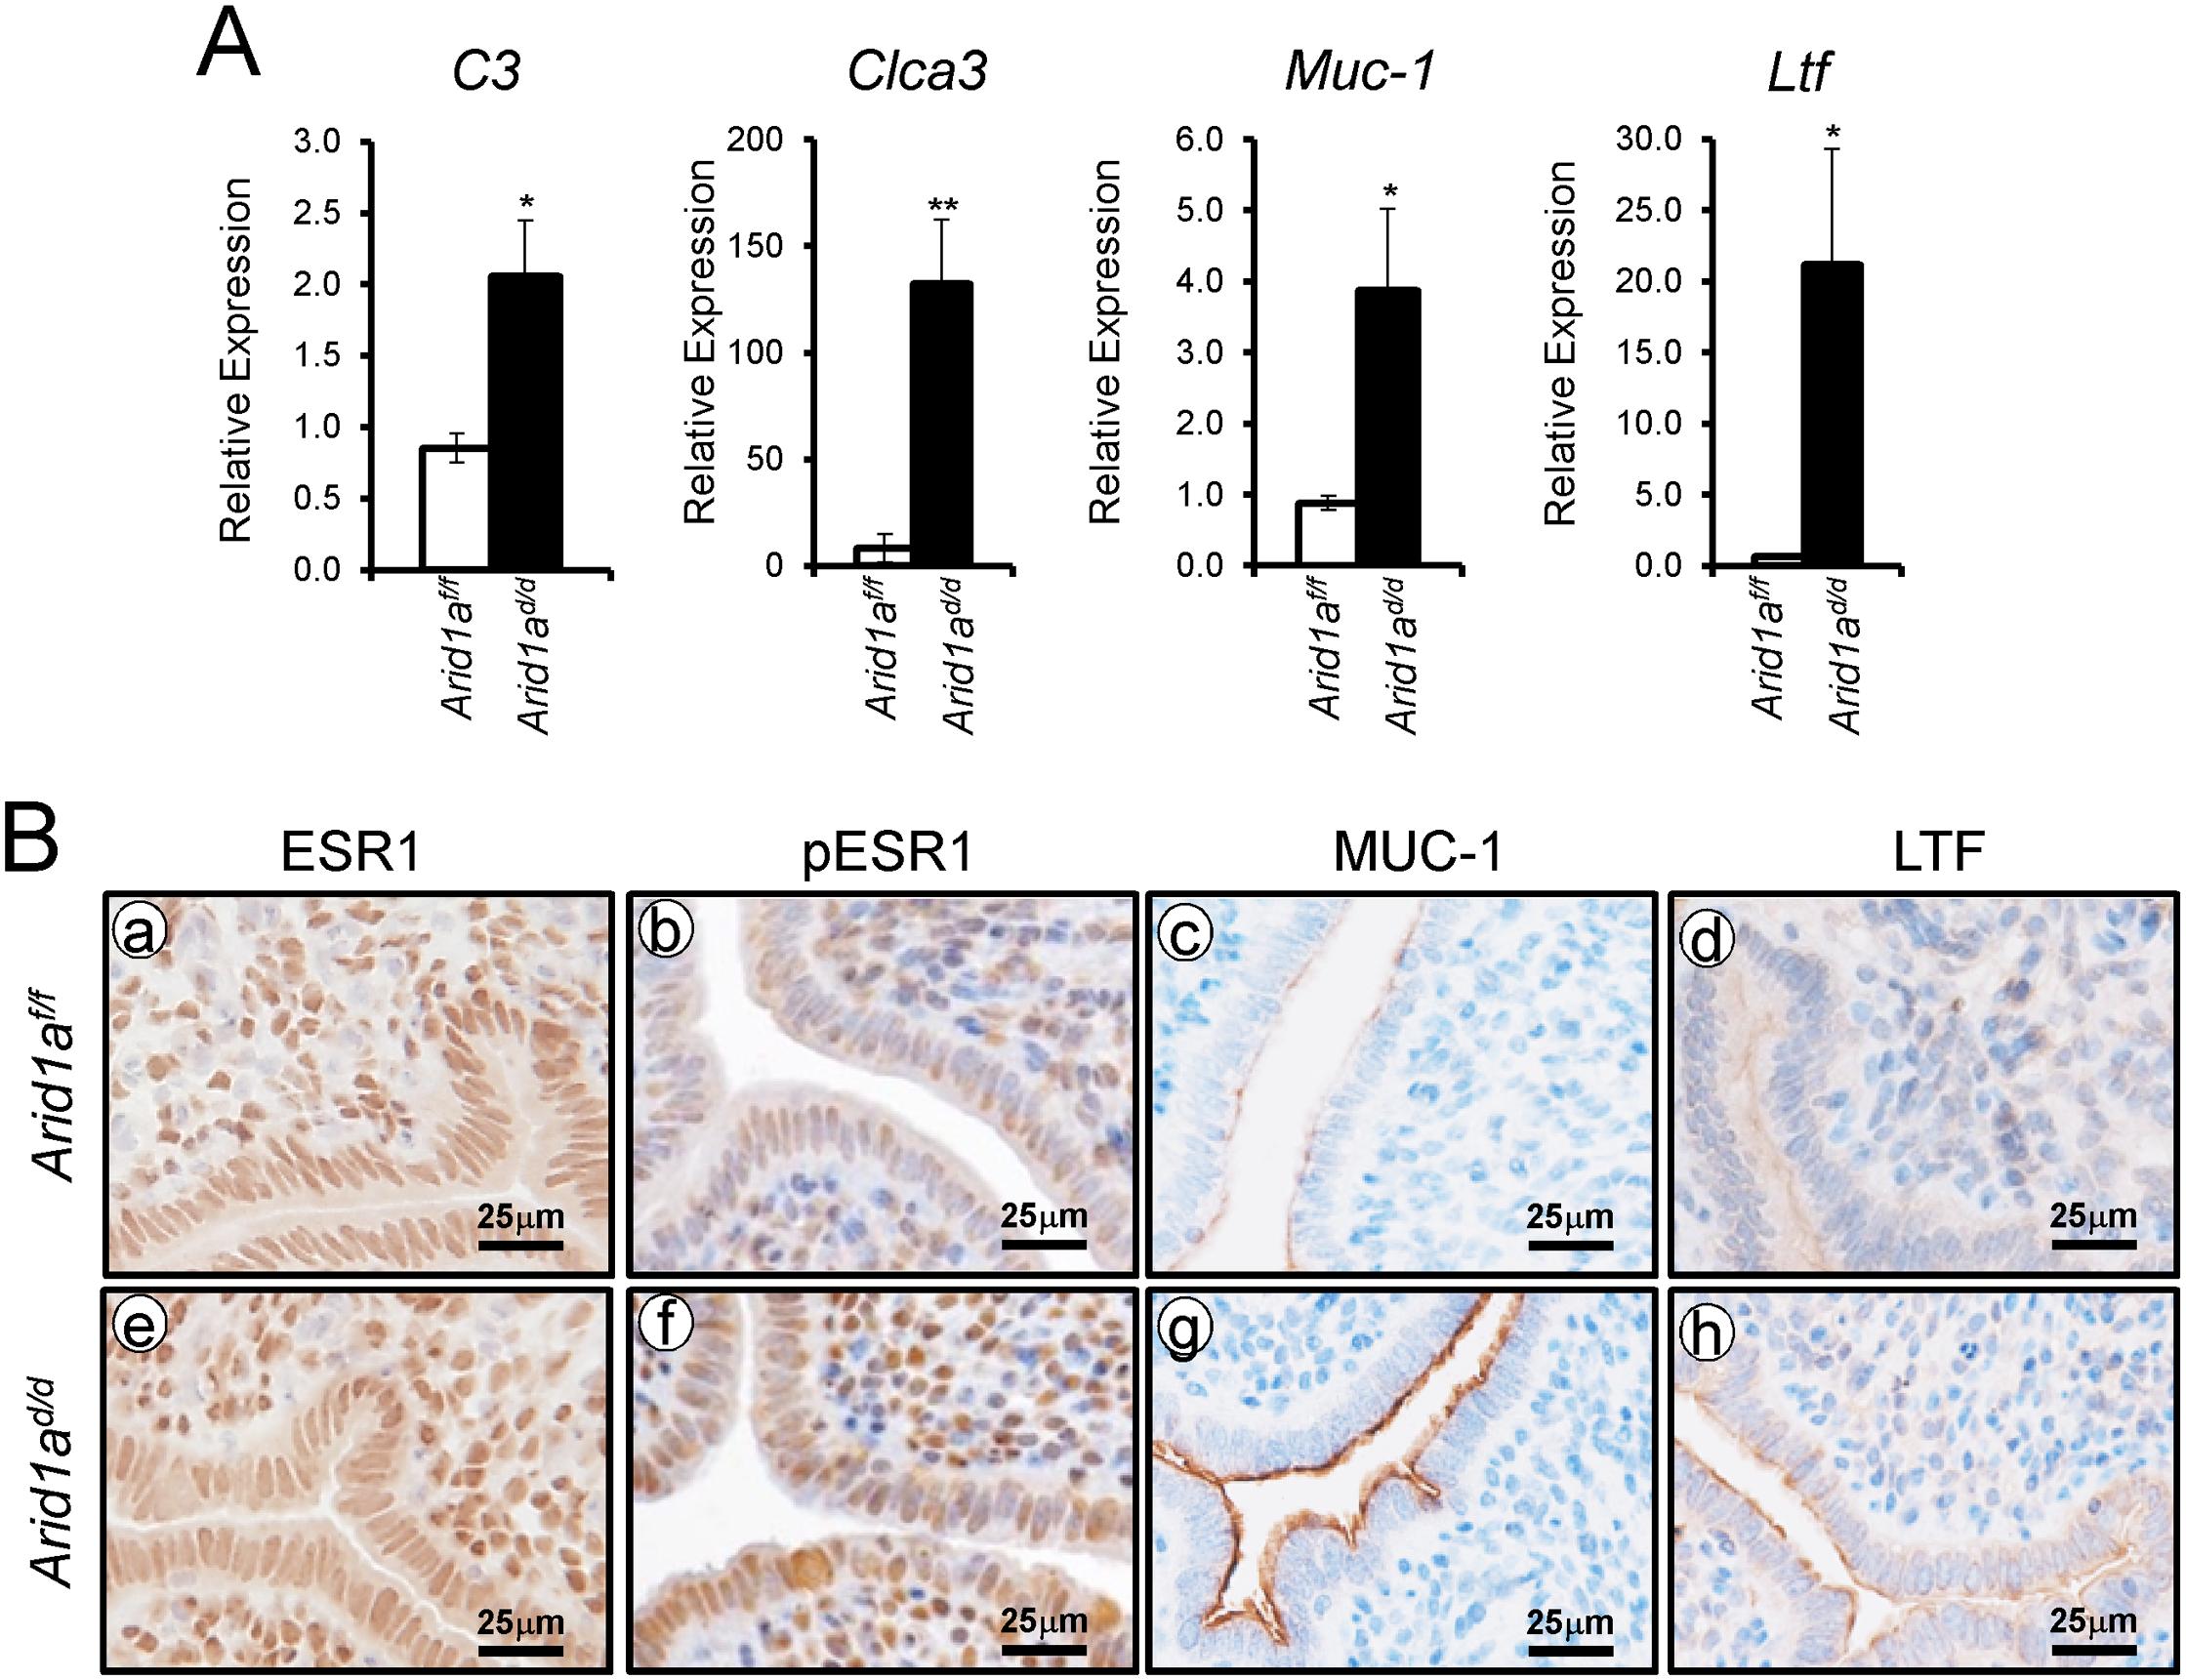 An increase of E2 signaling in <i>Arid1a</i><sup><i>d/d</i></sup> mice.